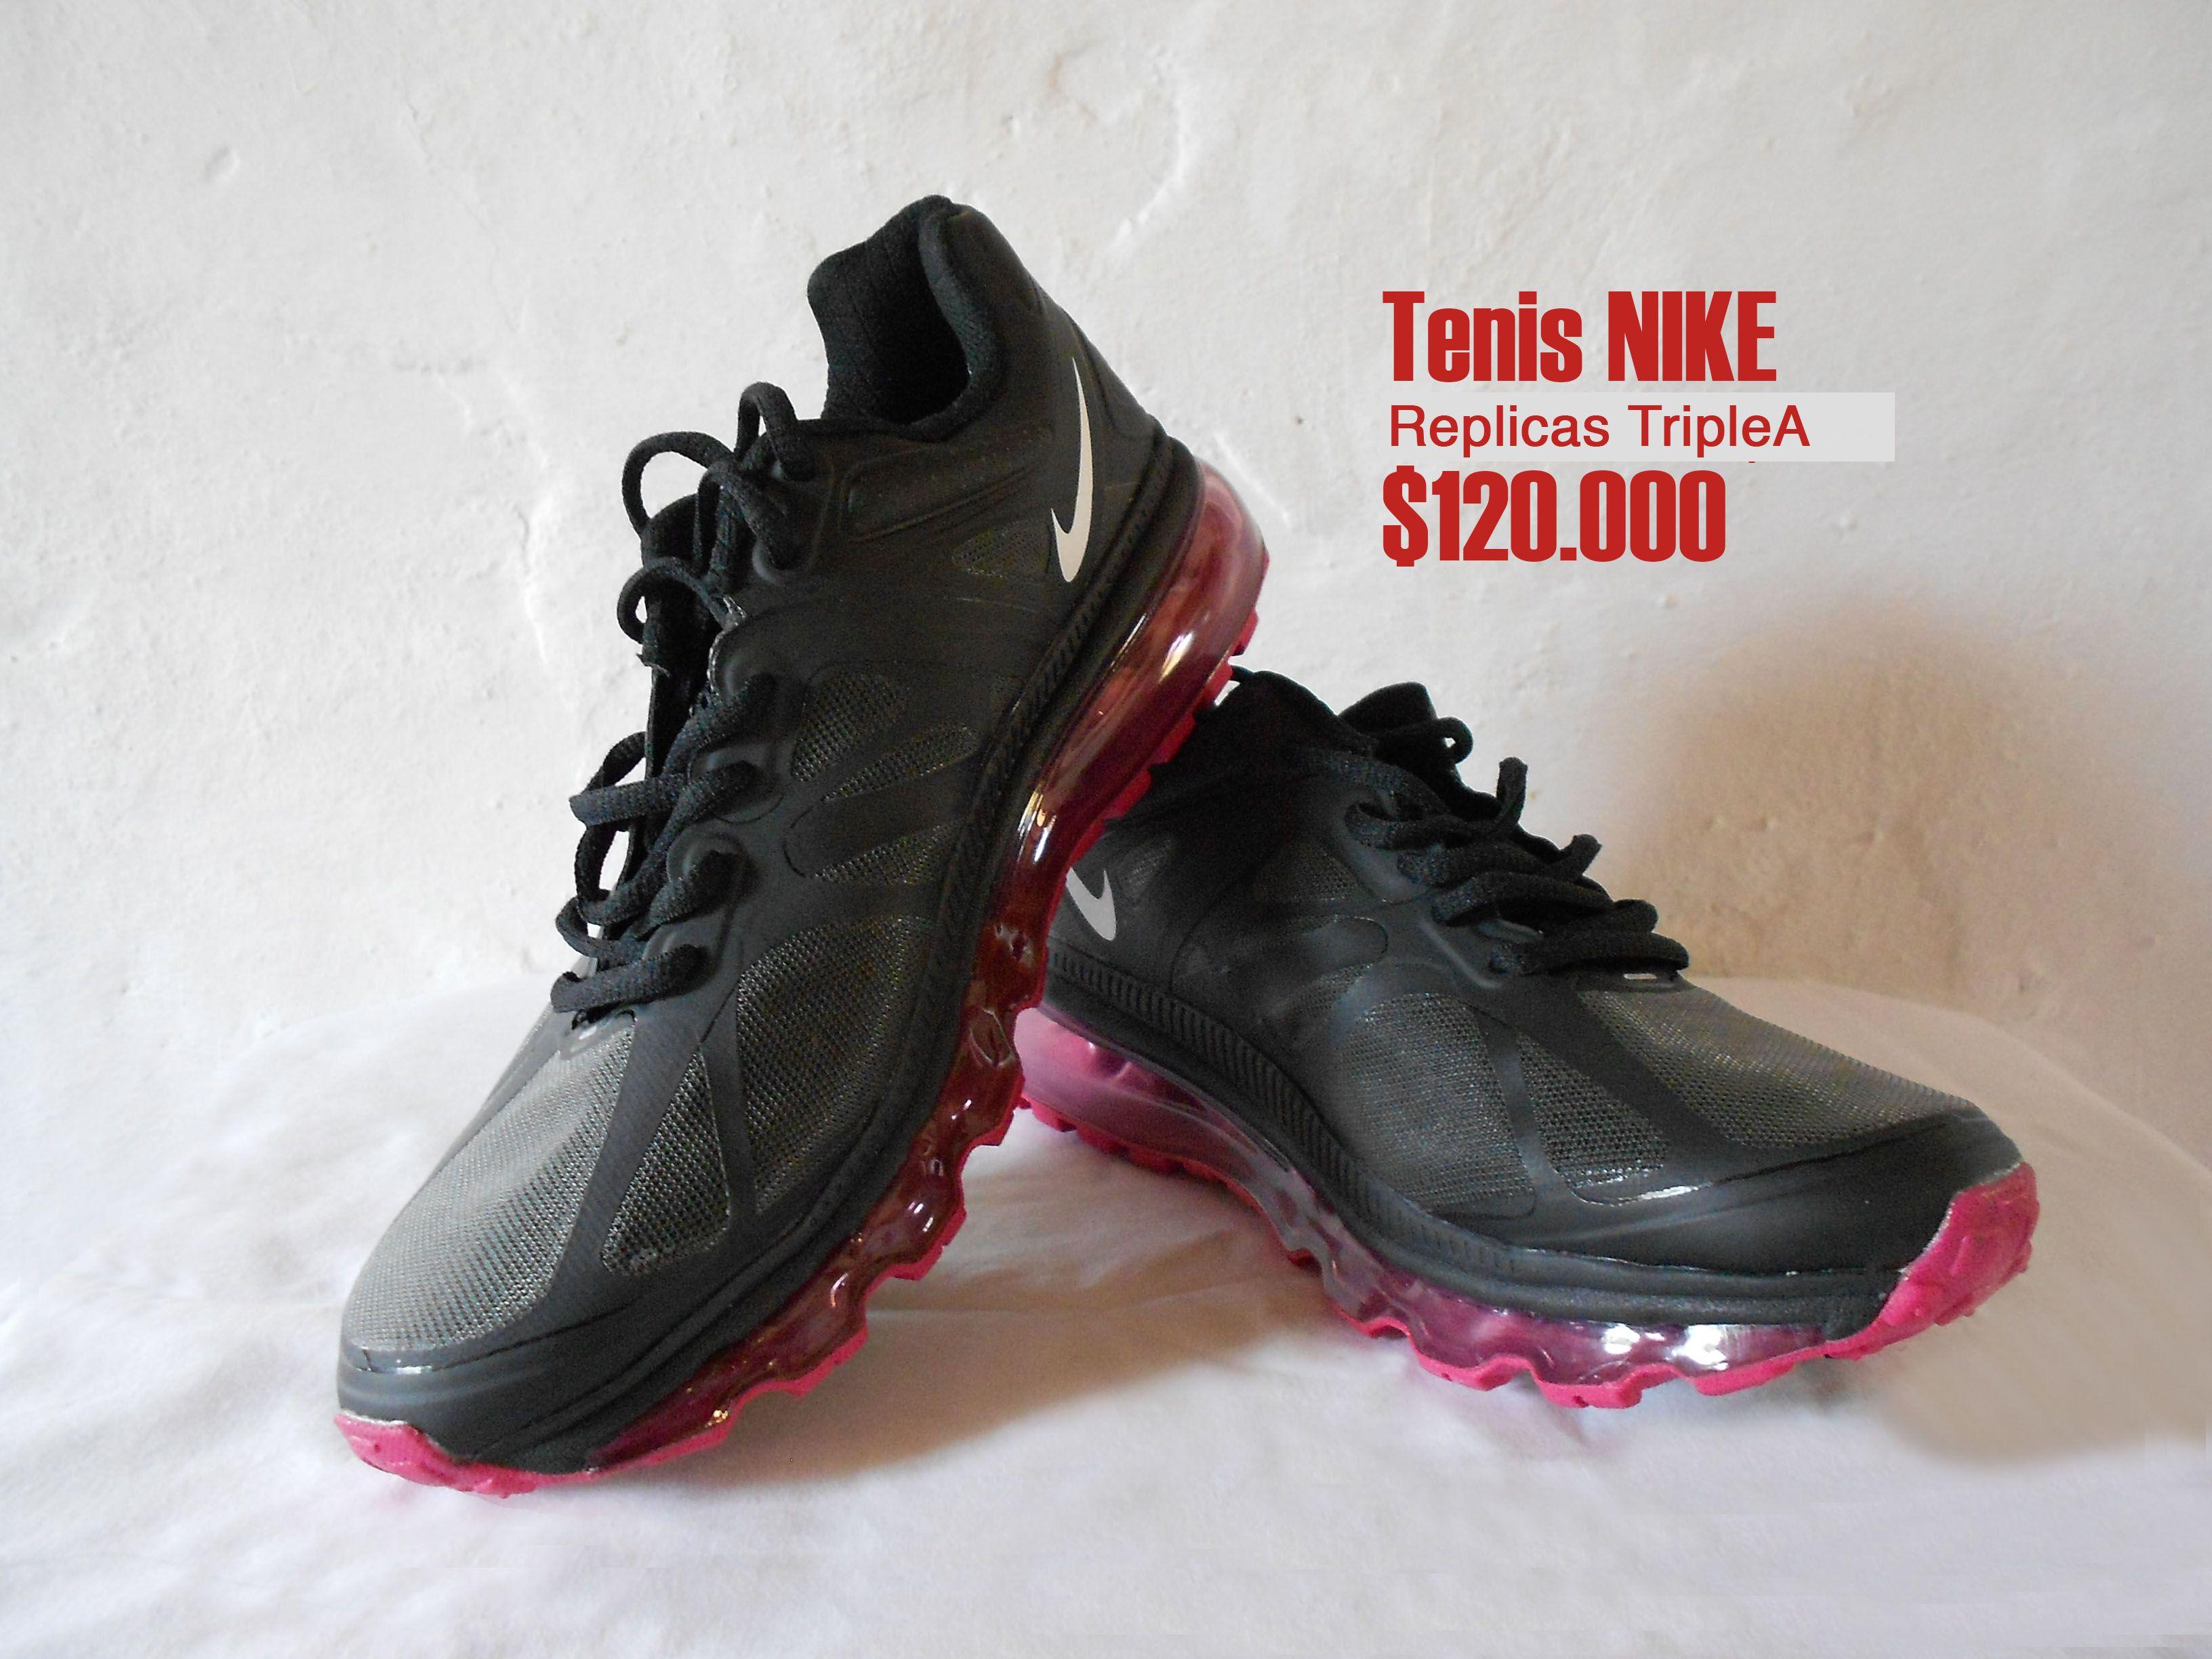 4249e927564 Tenis Nike - Replicas TripleA